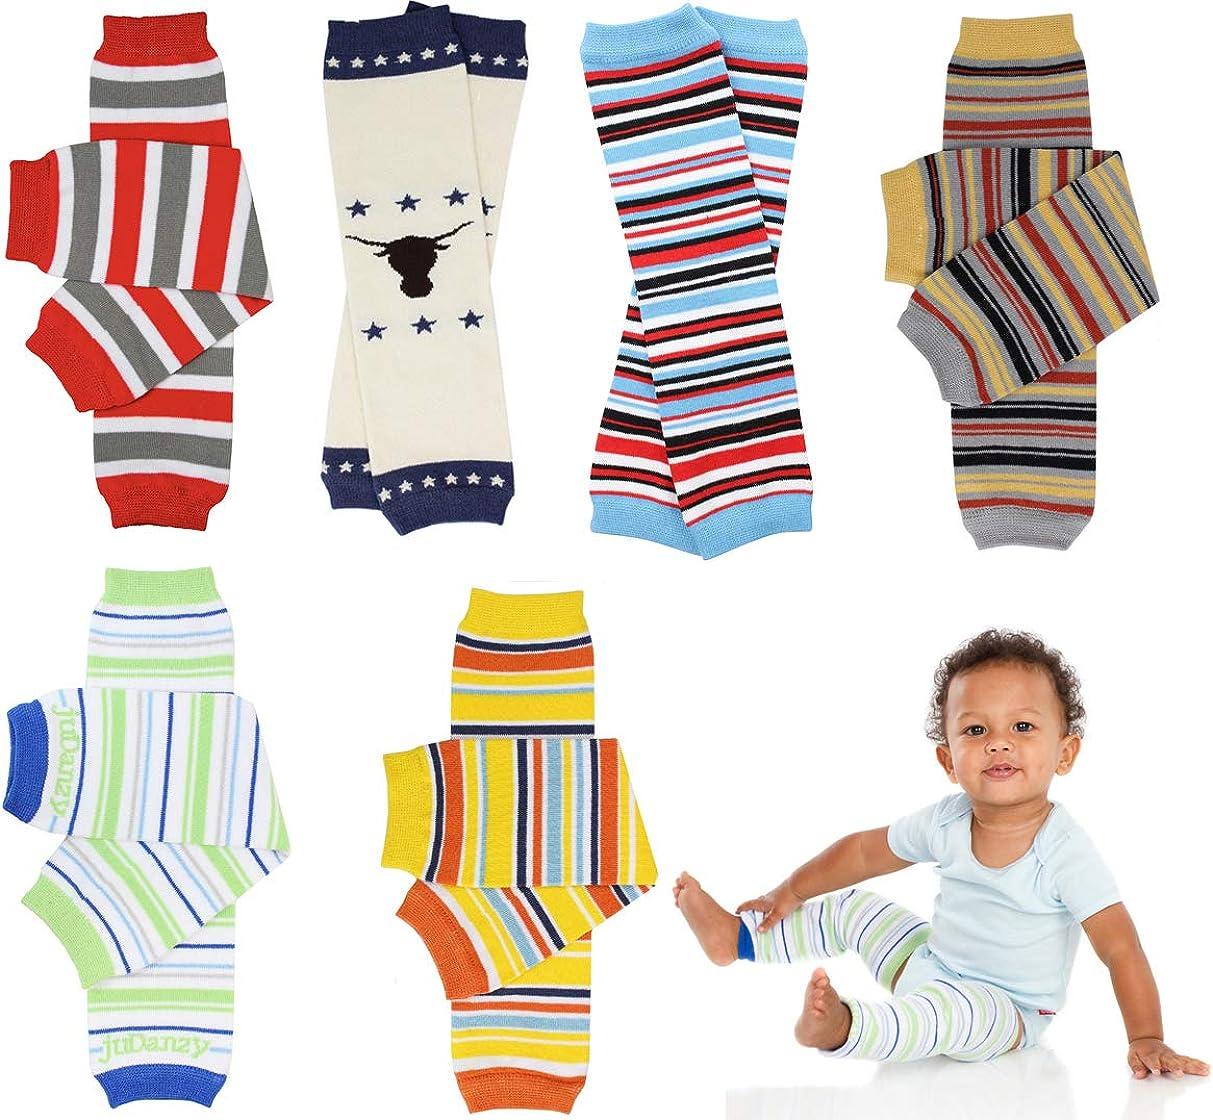 Adorable Baby Toddler Kid Child Star Stripe Hearts Socks Tights Arm Leg Warmers